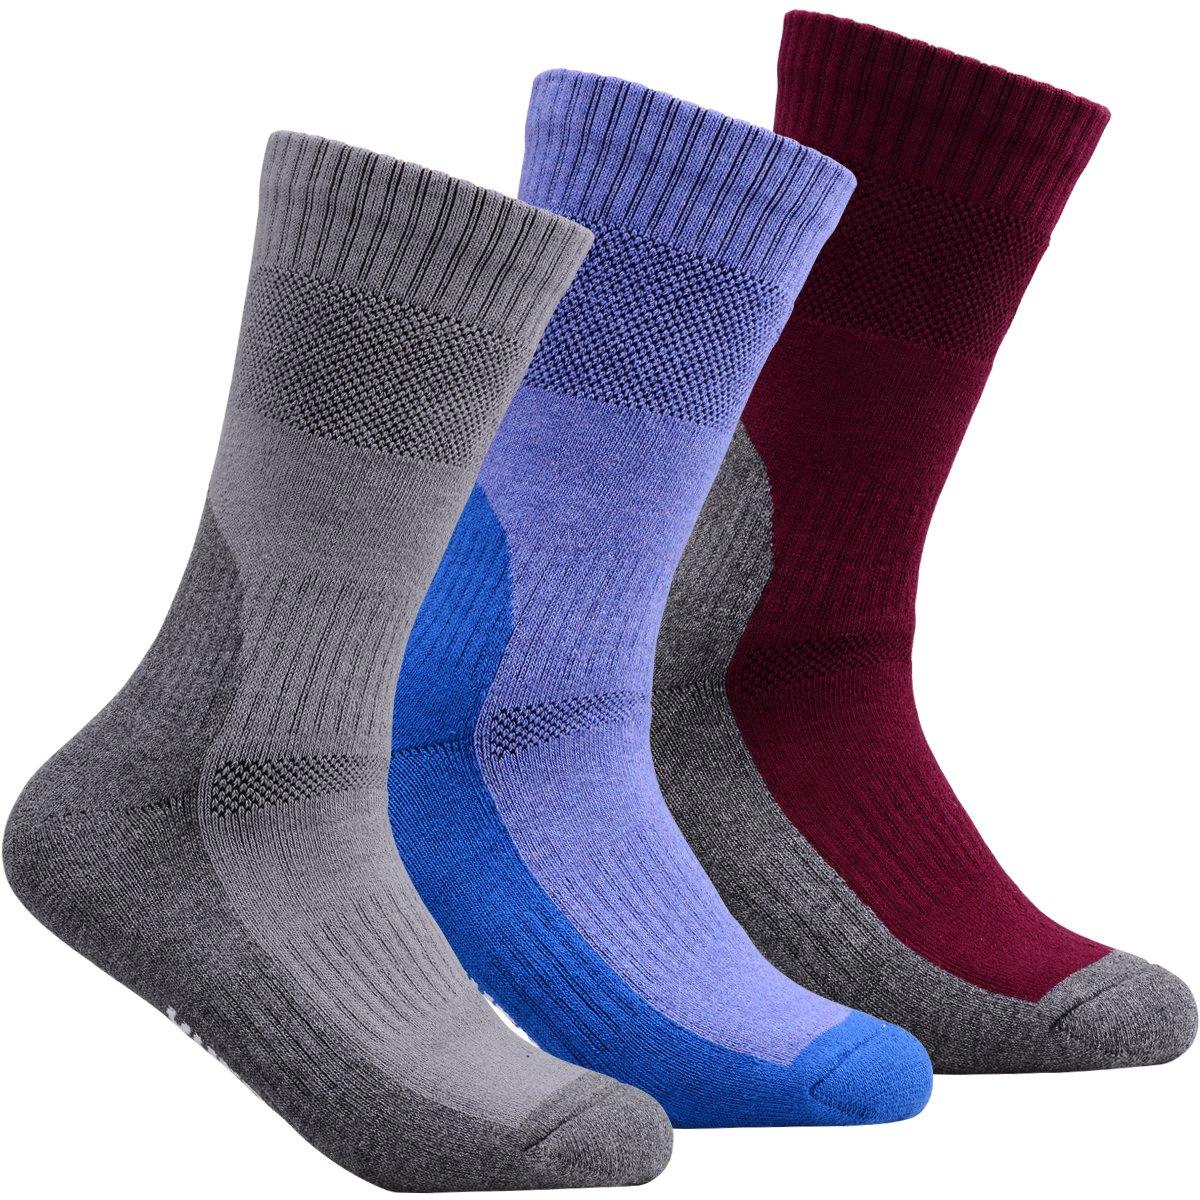 YUEDGE Performance Athletic Crew Socks (3 Pairs)